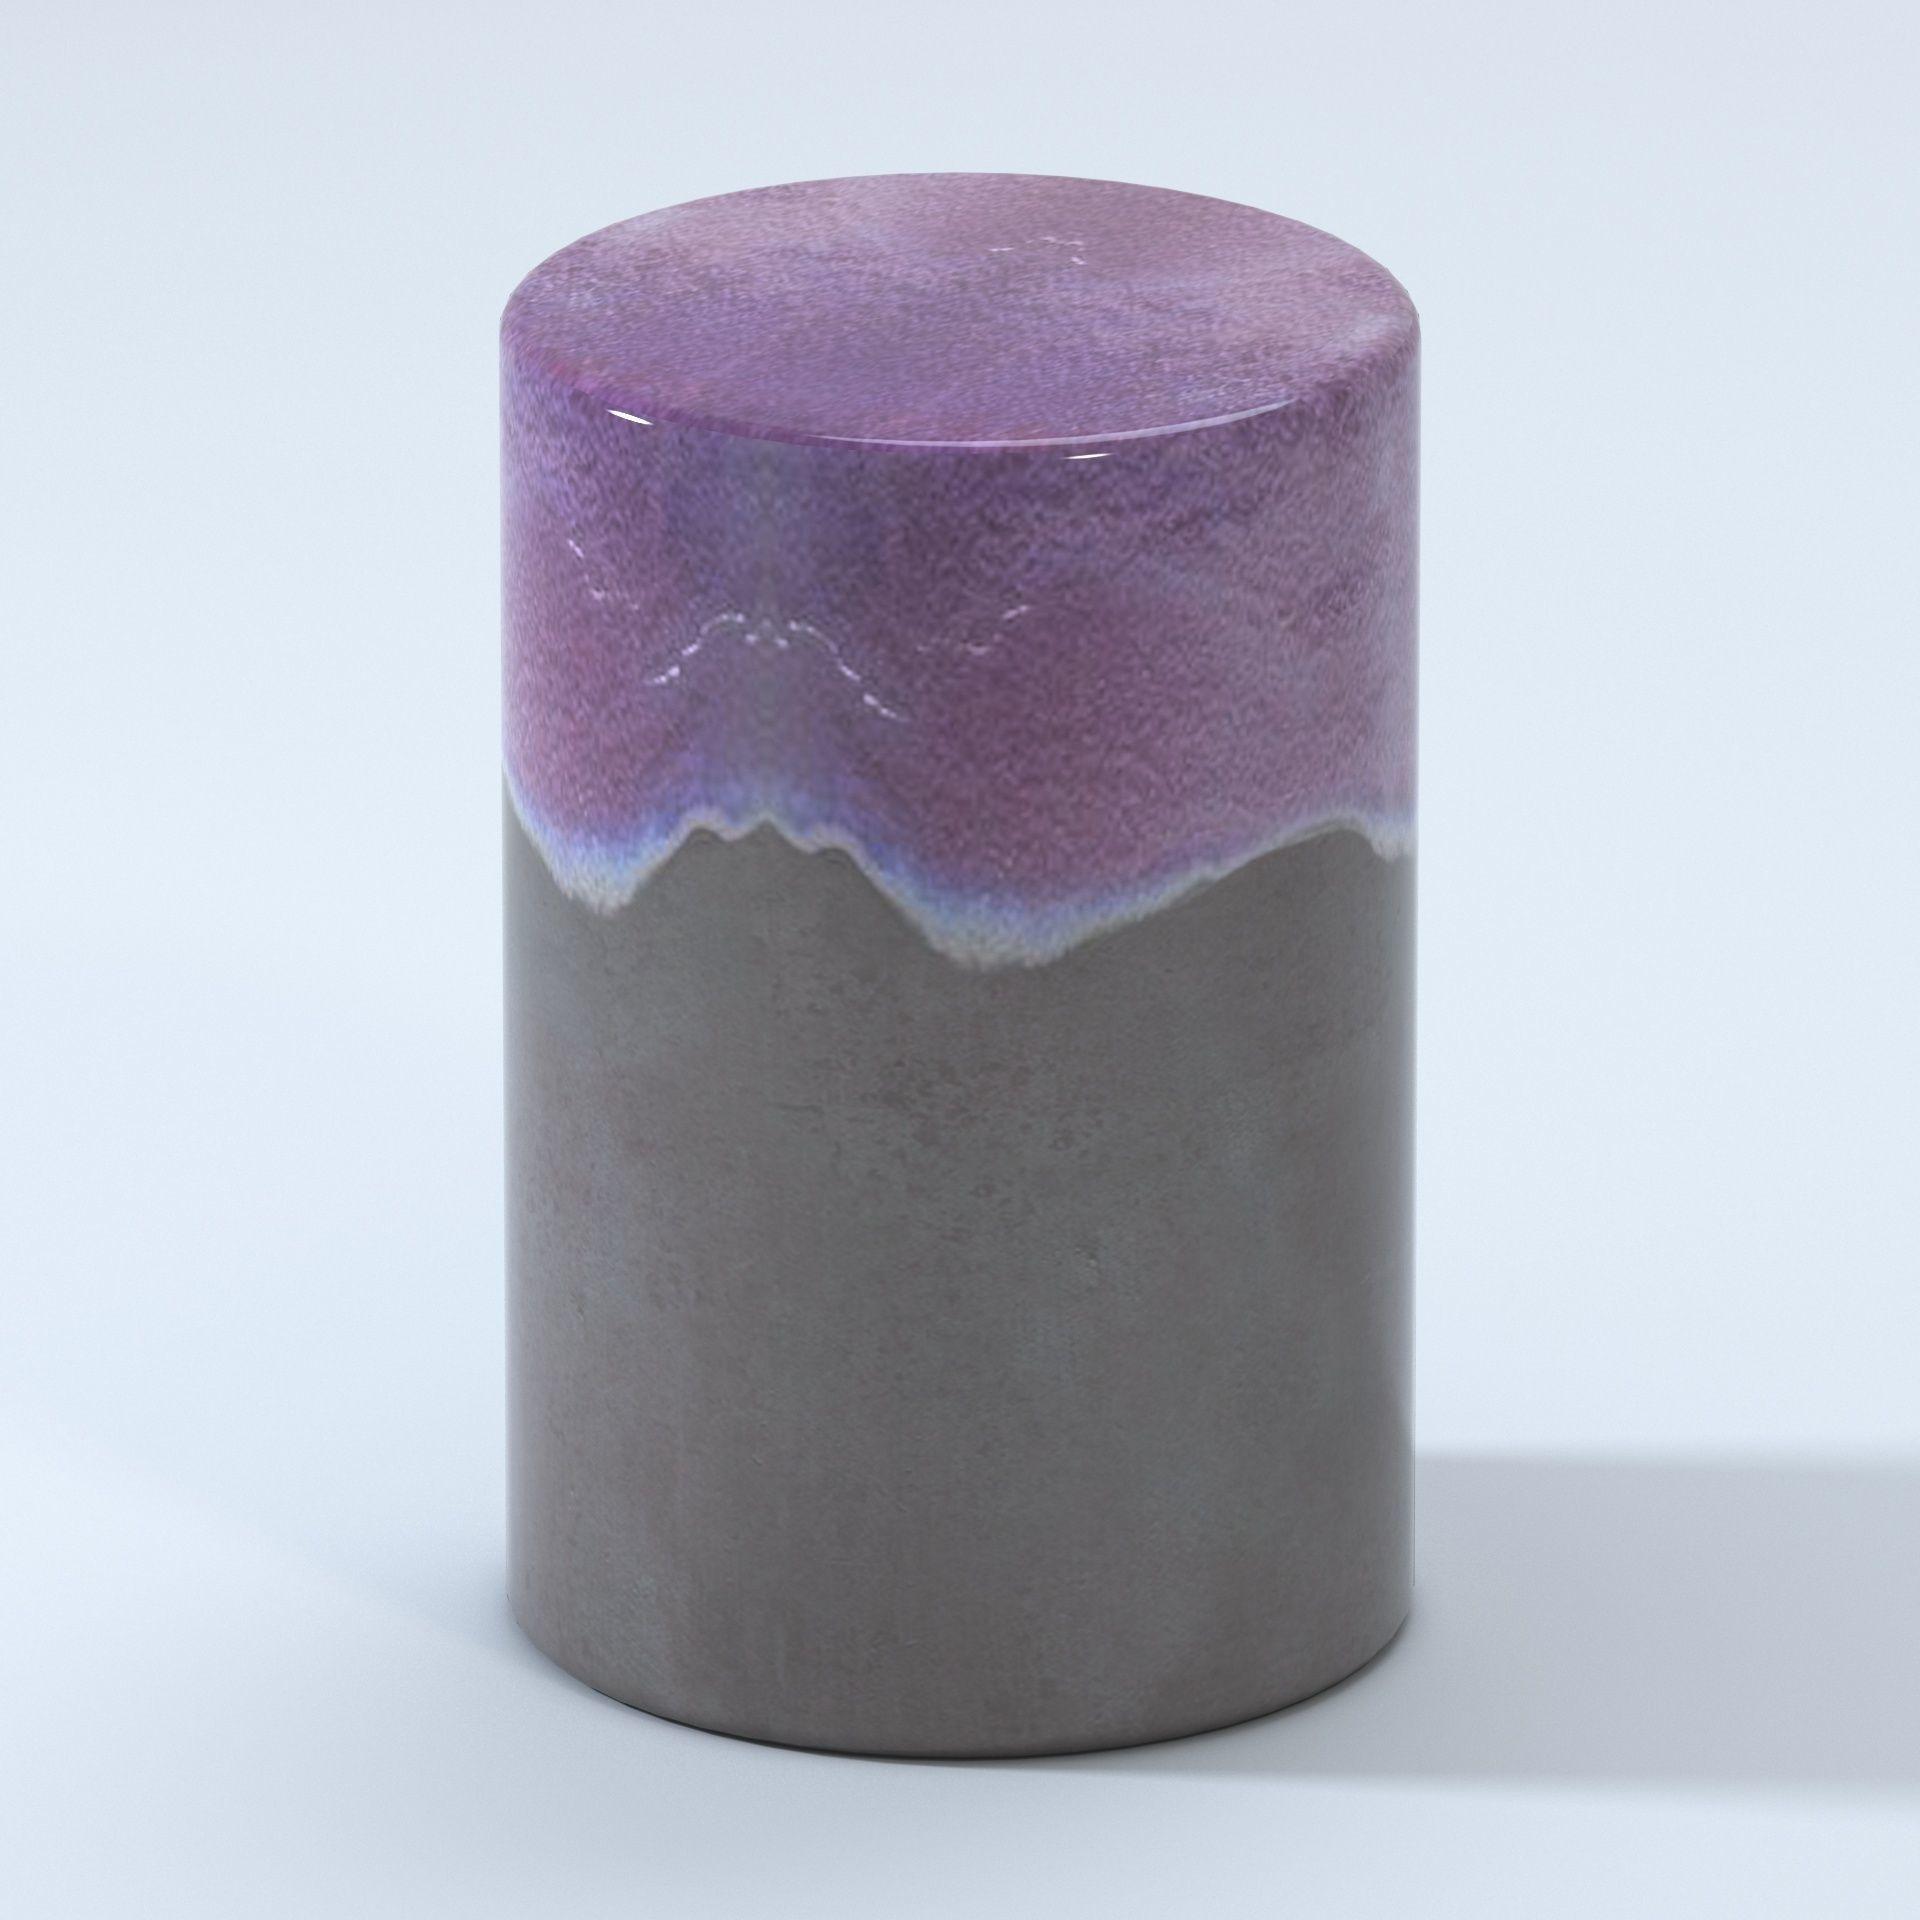 Outstanding Garden Ceramic Stool Two Tone Glaze 3D Model Gamerscity Chair Design For Home Gamerscityorg